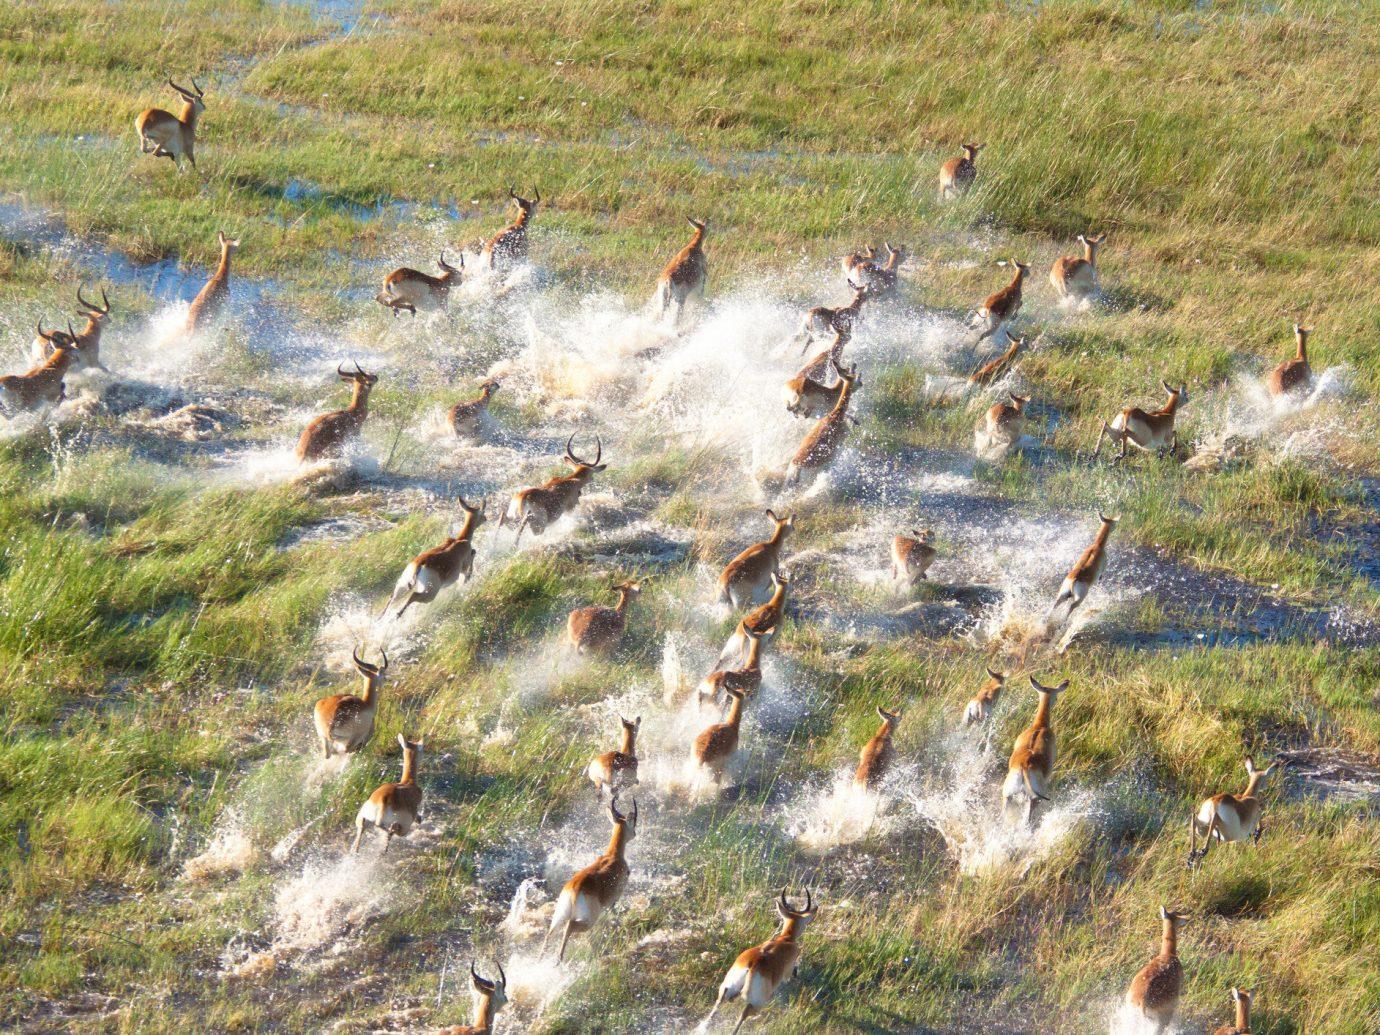 Influencers + Tastemakers Travel Shop Trip Ideas grass outdoor Bird Wildlife wilderness fauna field wetland tundra flock duck group water bird swamp pond